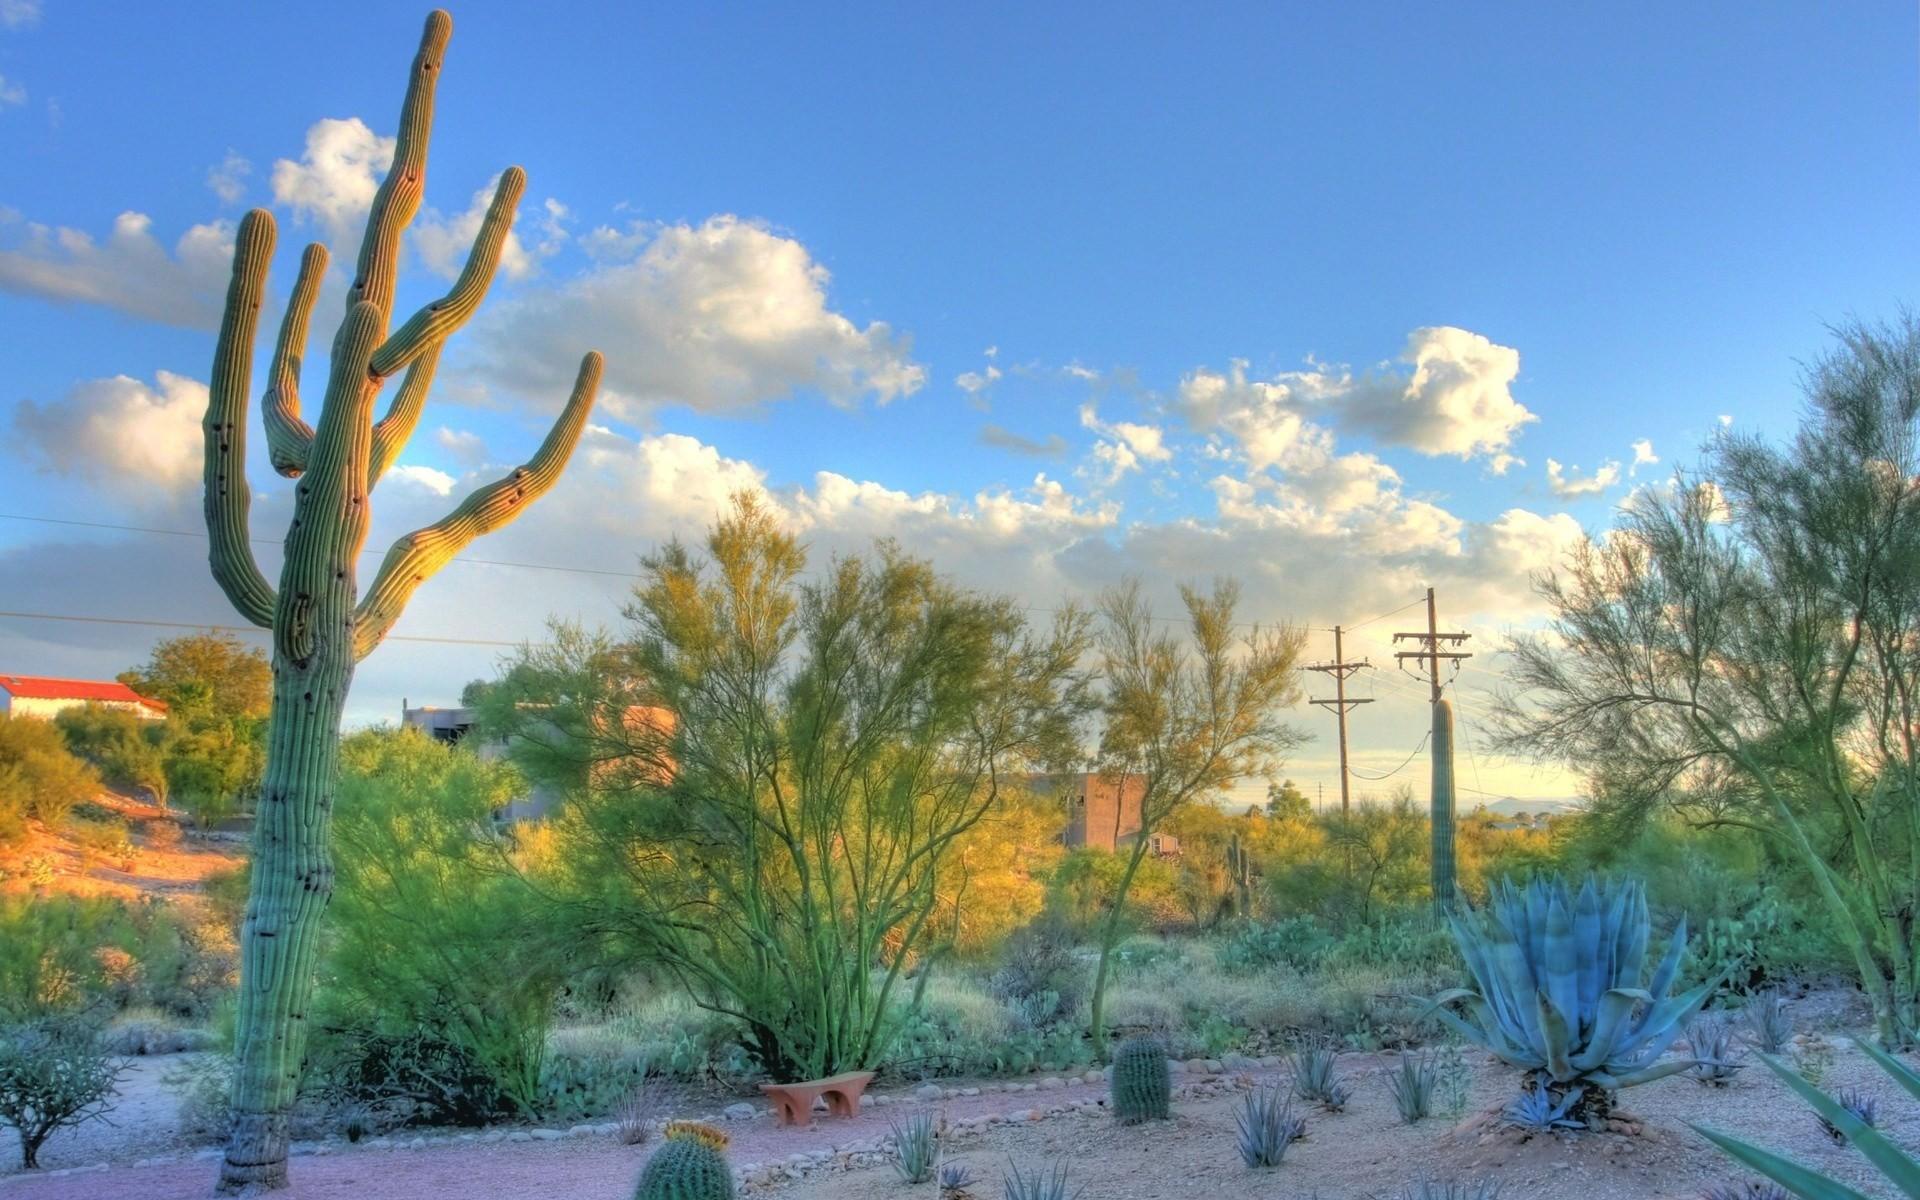 1920 x 1200 px arizona desert wallpaper free hd widescreen by Sunday Black